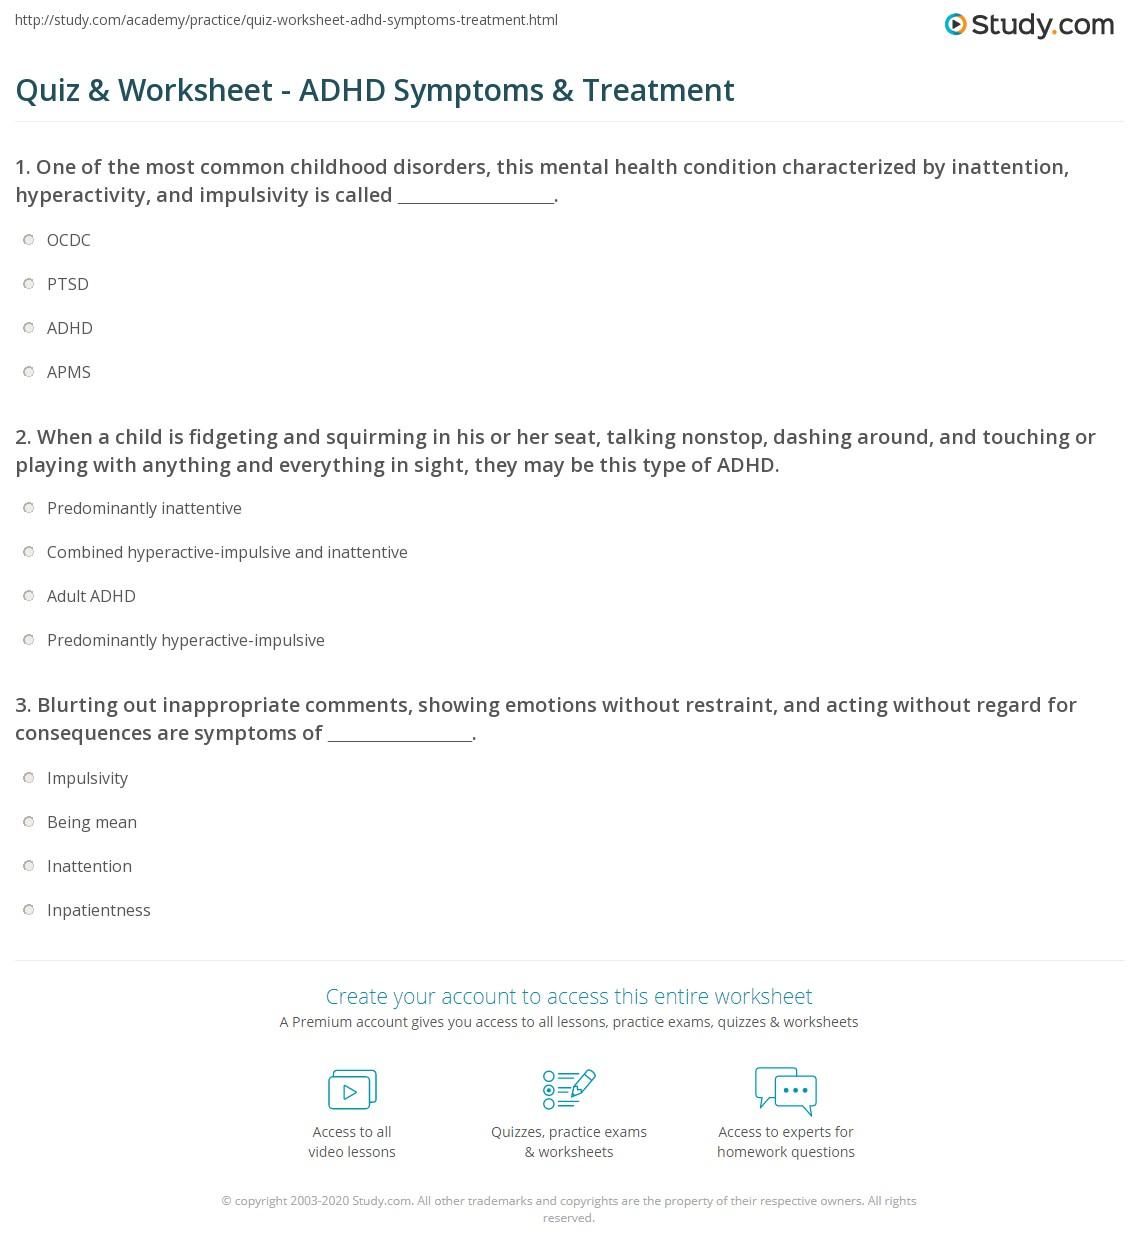 Workbooks worksheets for adhd : Quiz & Worksheet - ADHD Symptoms & Treatment | Study.com